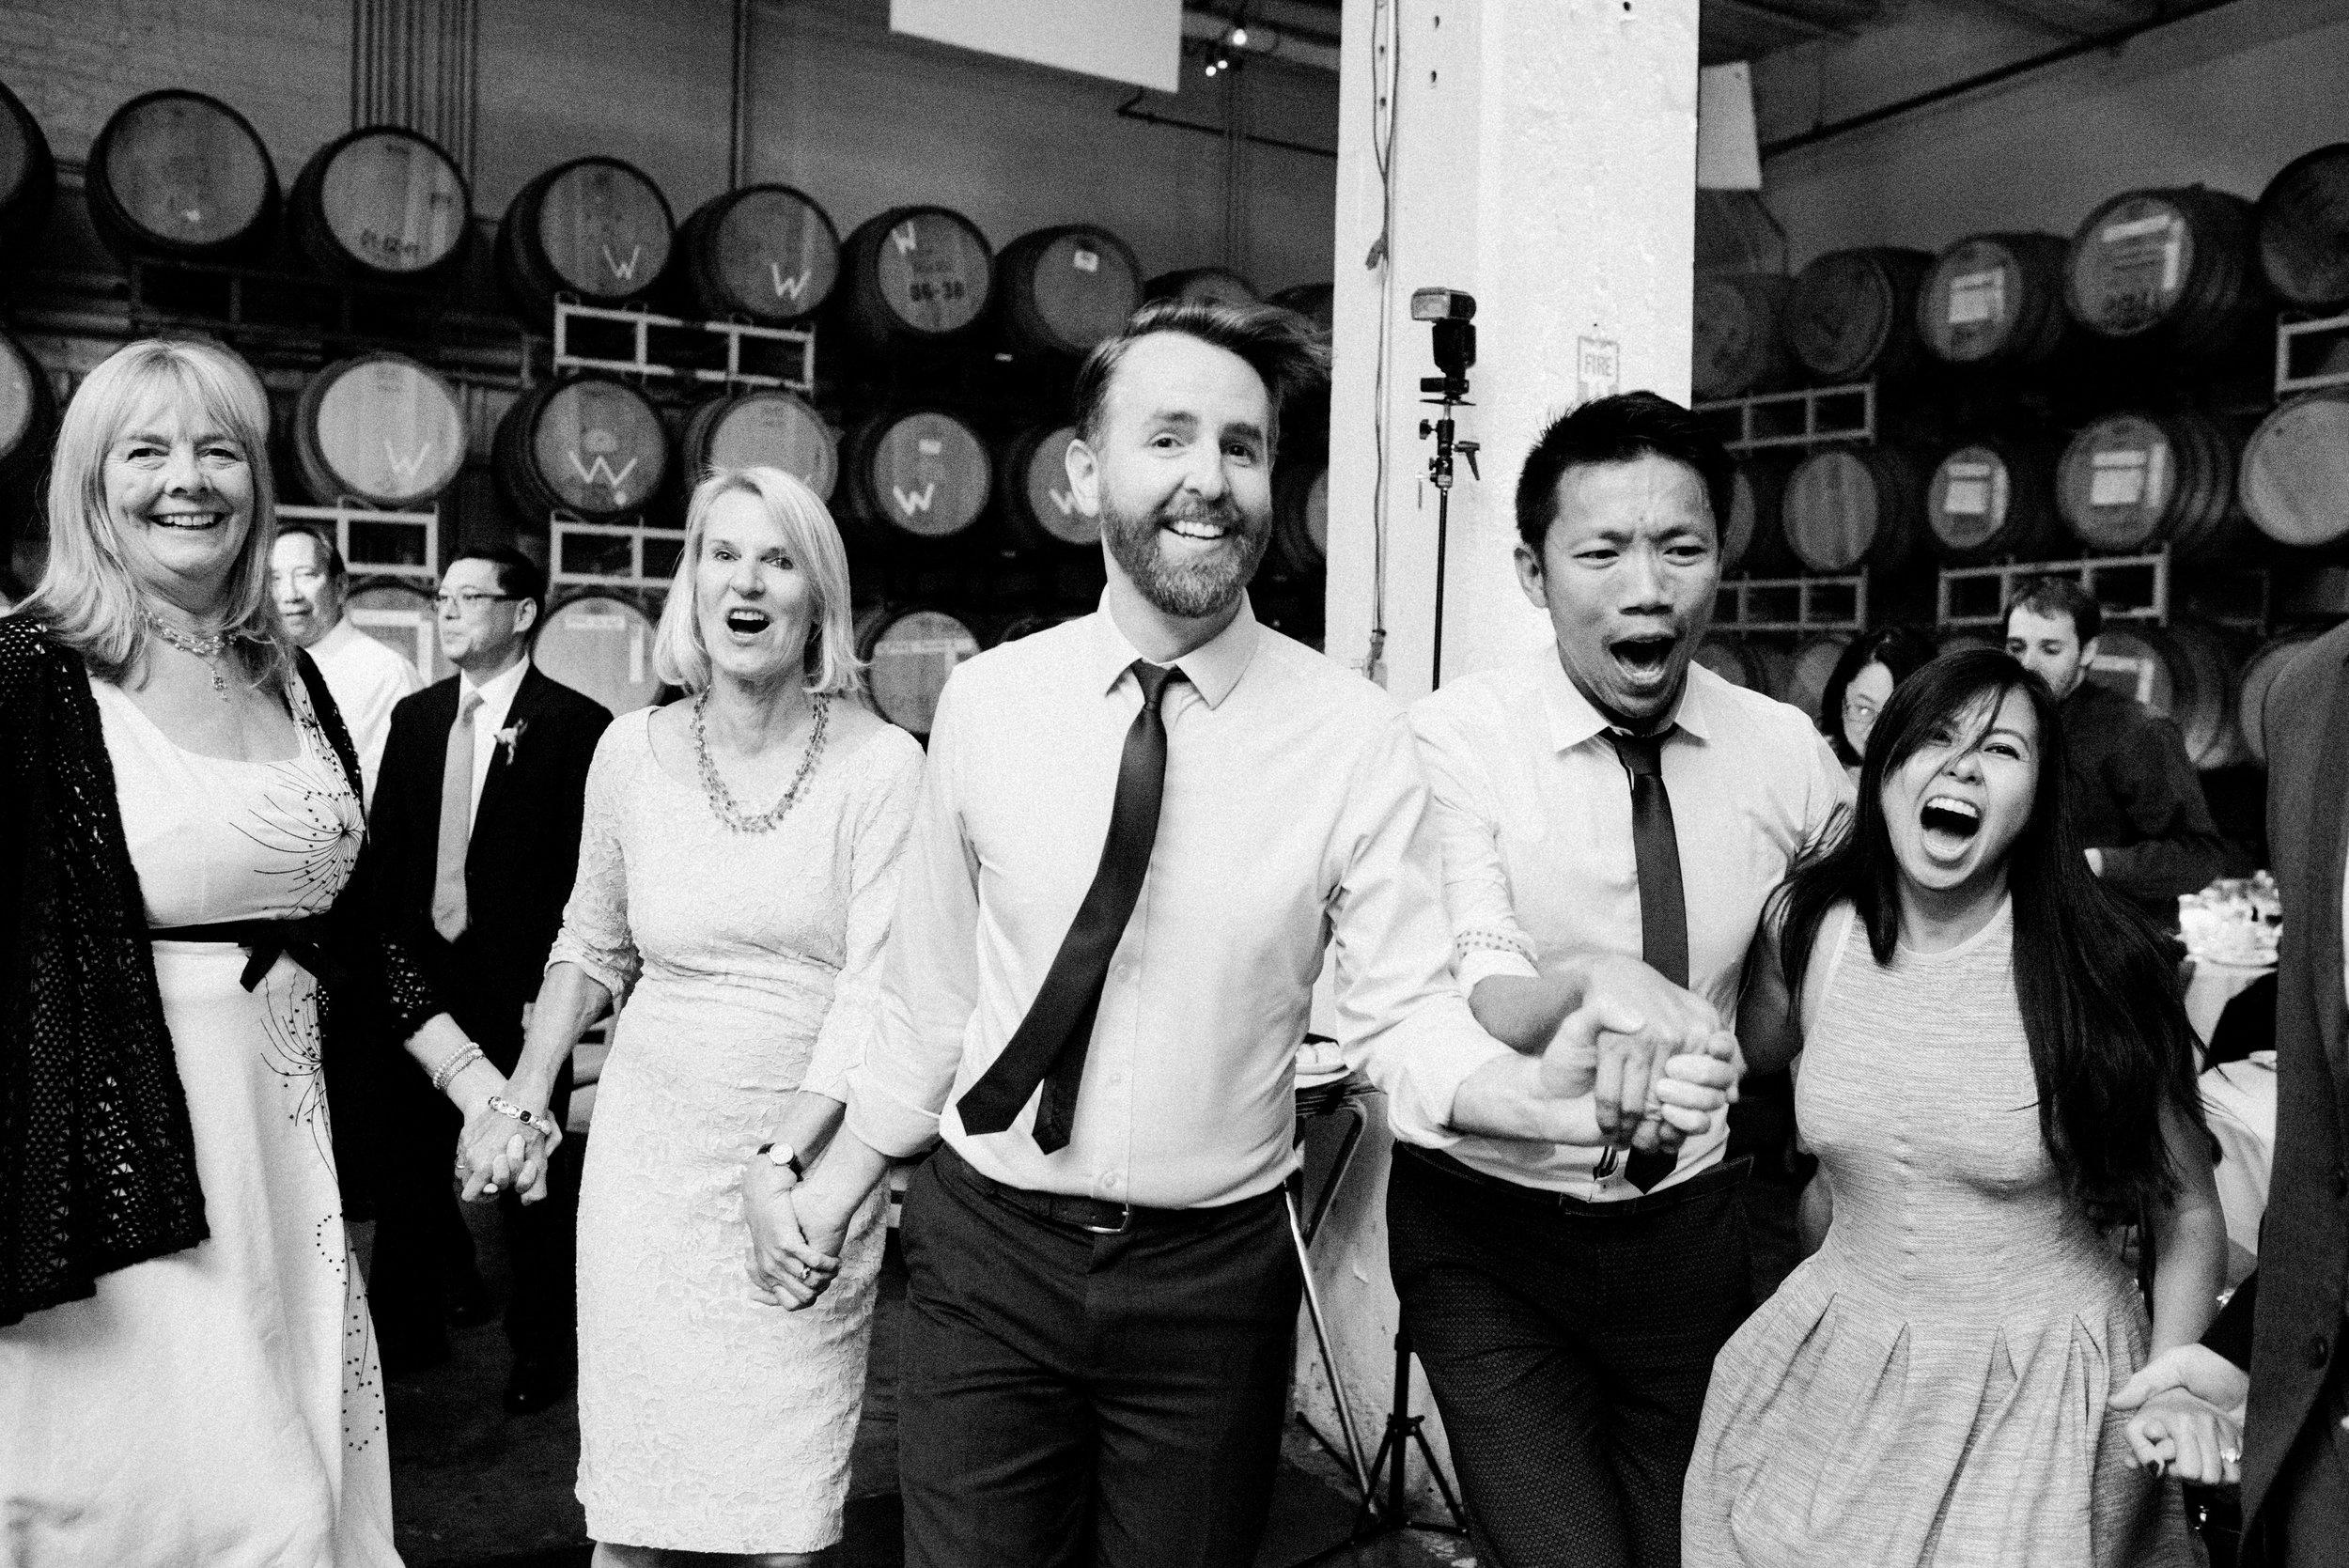 Swedenborgian Church Dogpatch Winery Wedding096.jpg